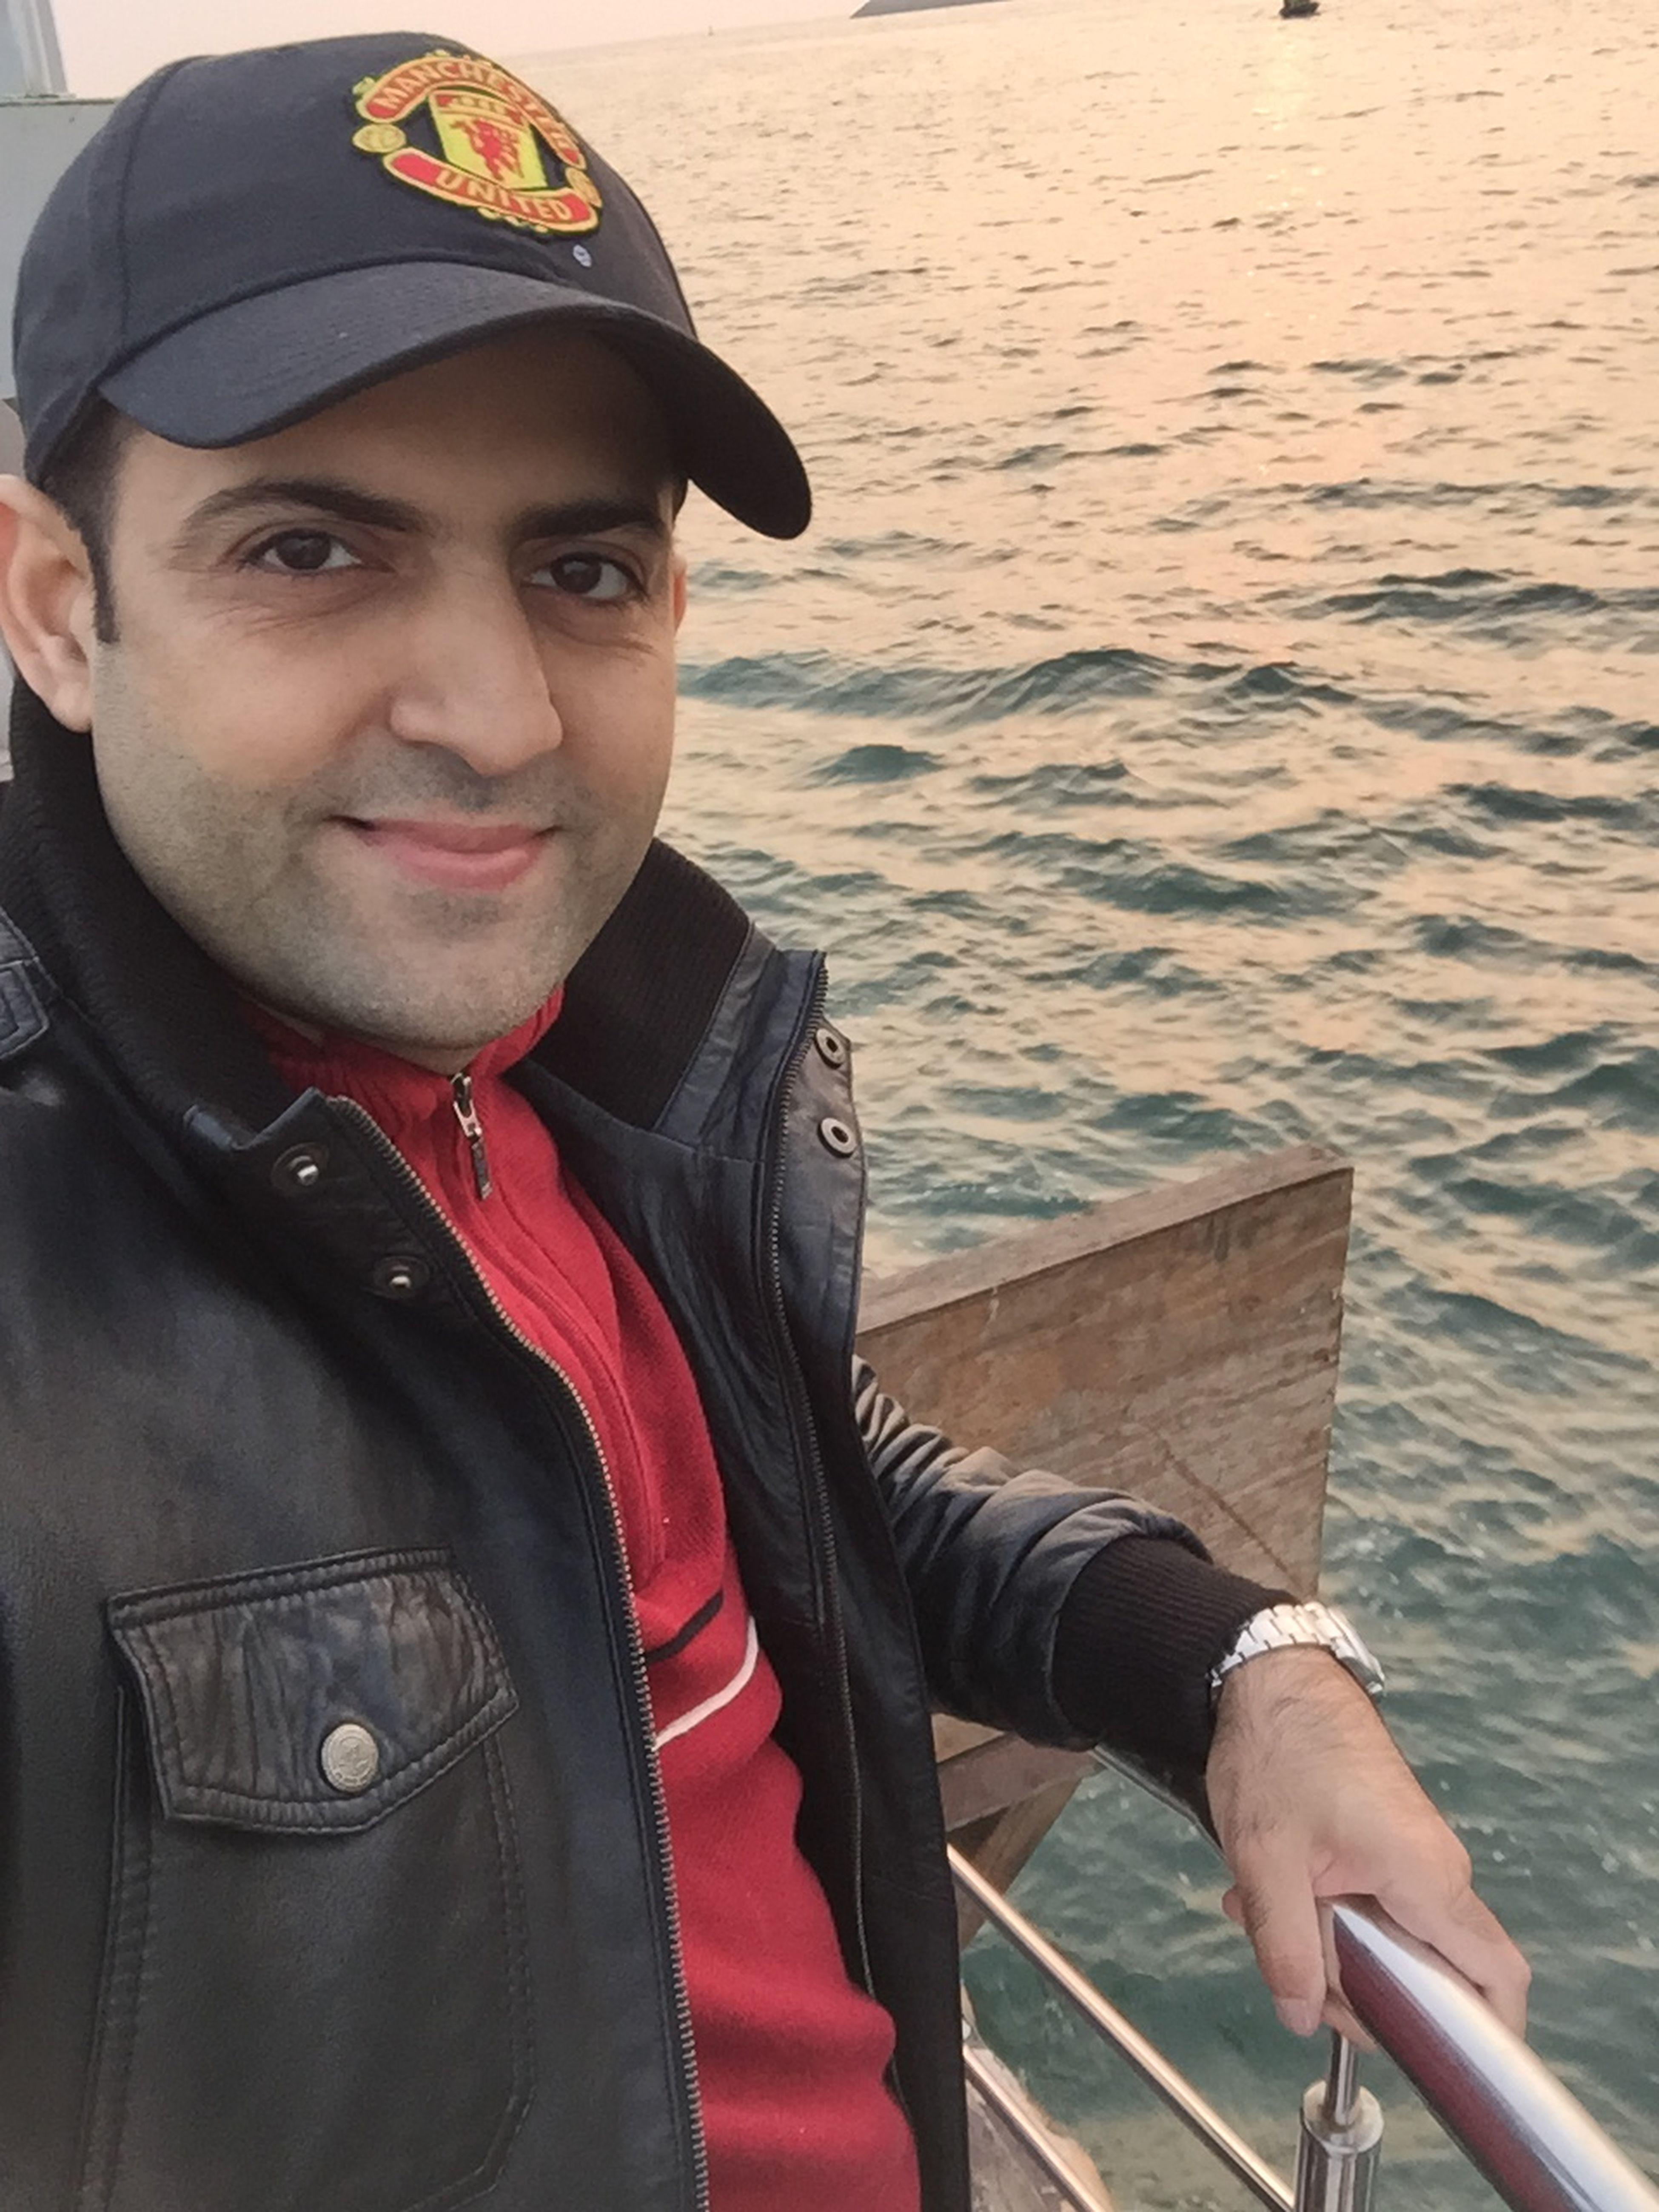 It's Me 😊 Selfie ✌ Sea Breeze Smiling